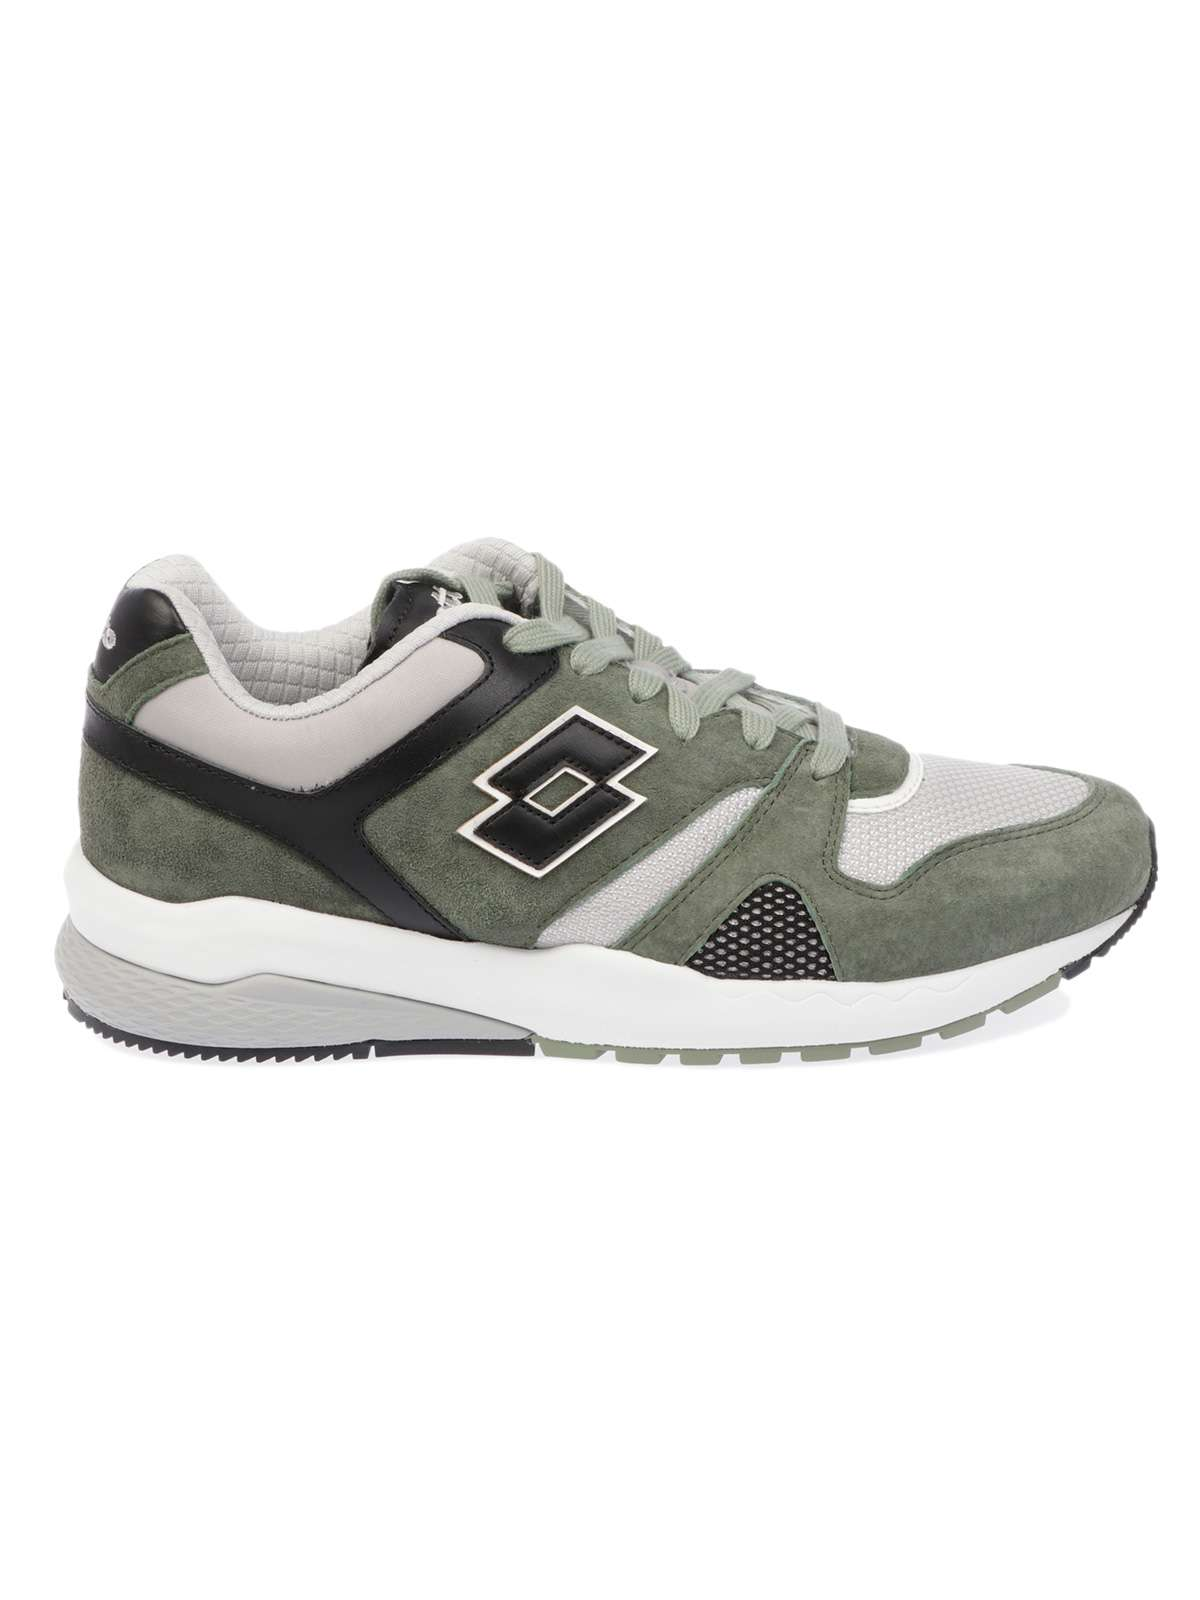 https://www.parmax.com/media/catalog/product/a/i/AI-outlet_parmax-scarpe-uomo-Lotto-211149-A.jpg